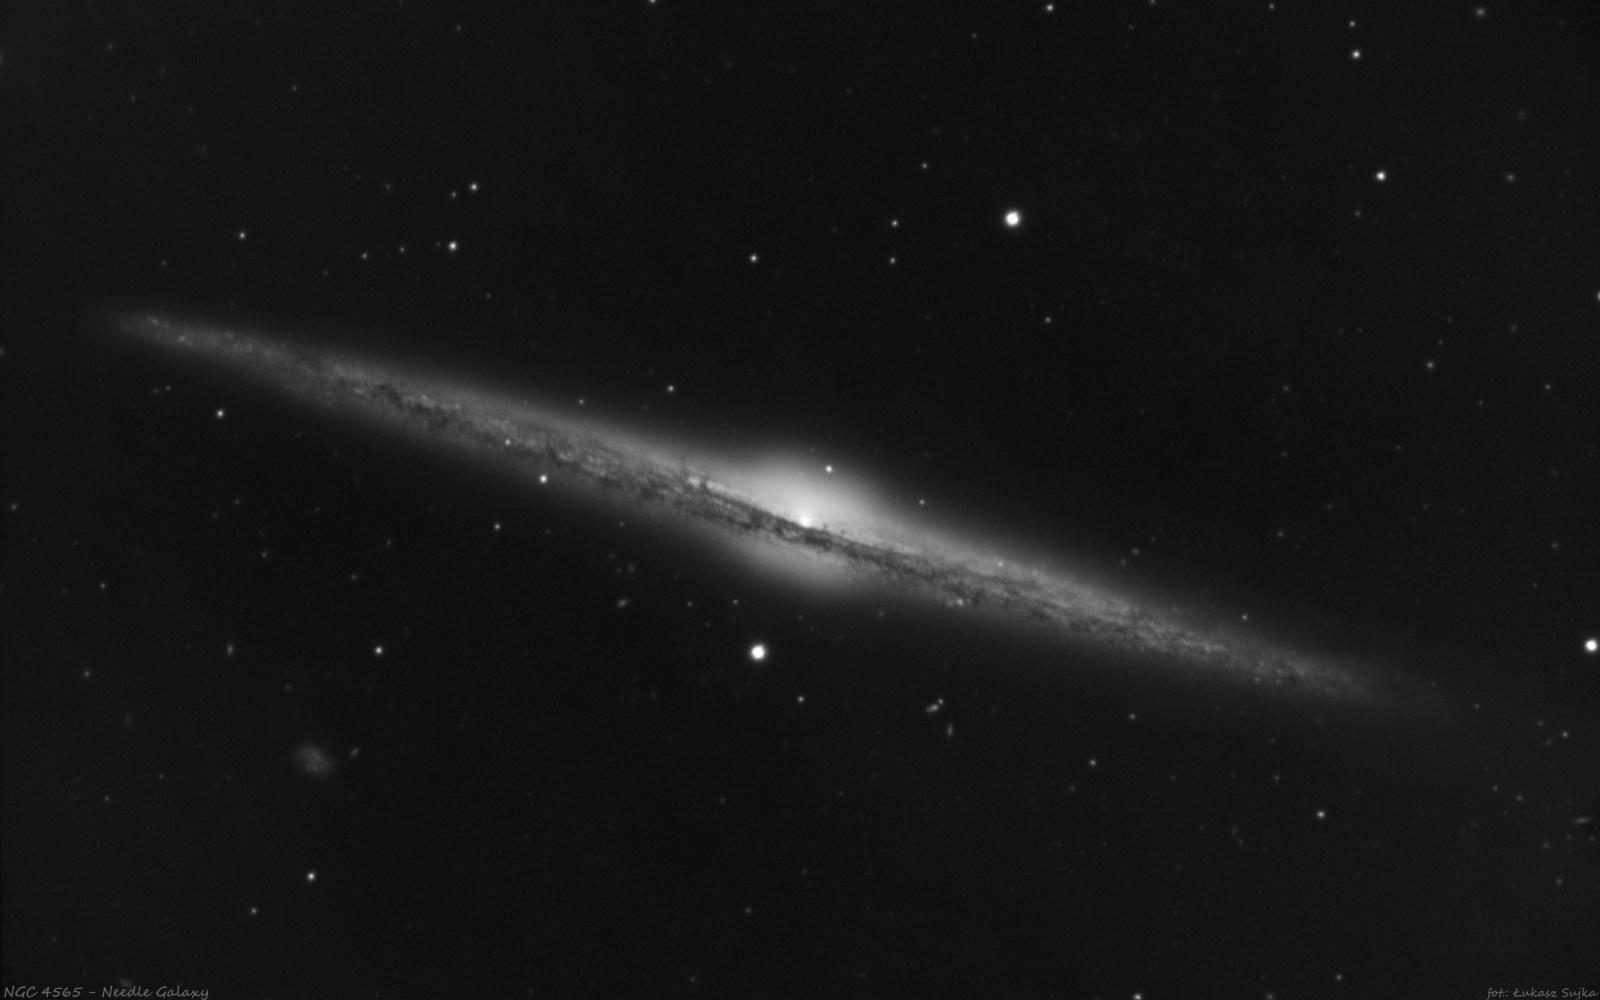 1569030876_NGC4565b_w80pr.thumb.jpg.bb1efe3f3d4b61b3353bfcdead4c1496.jpg